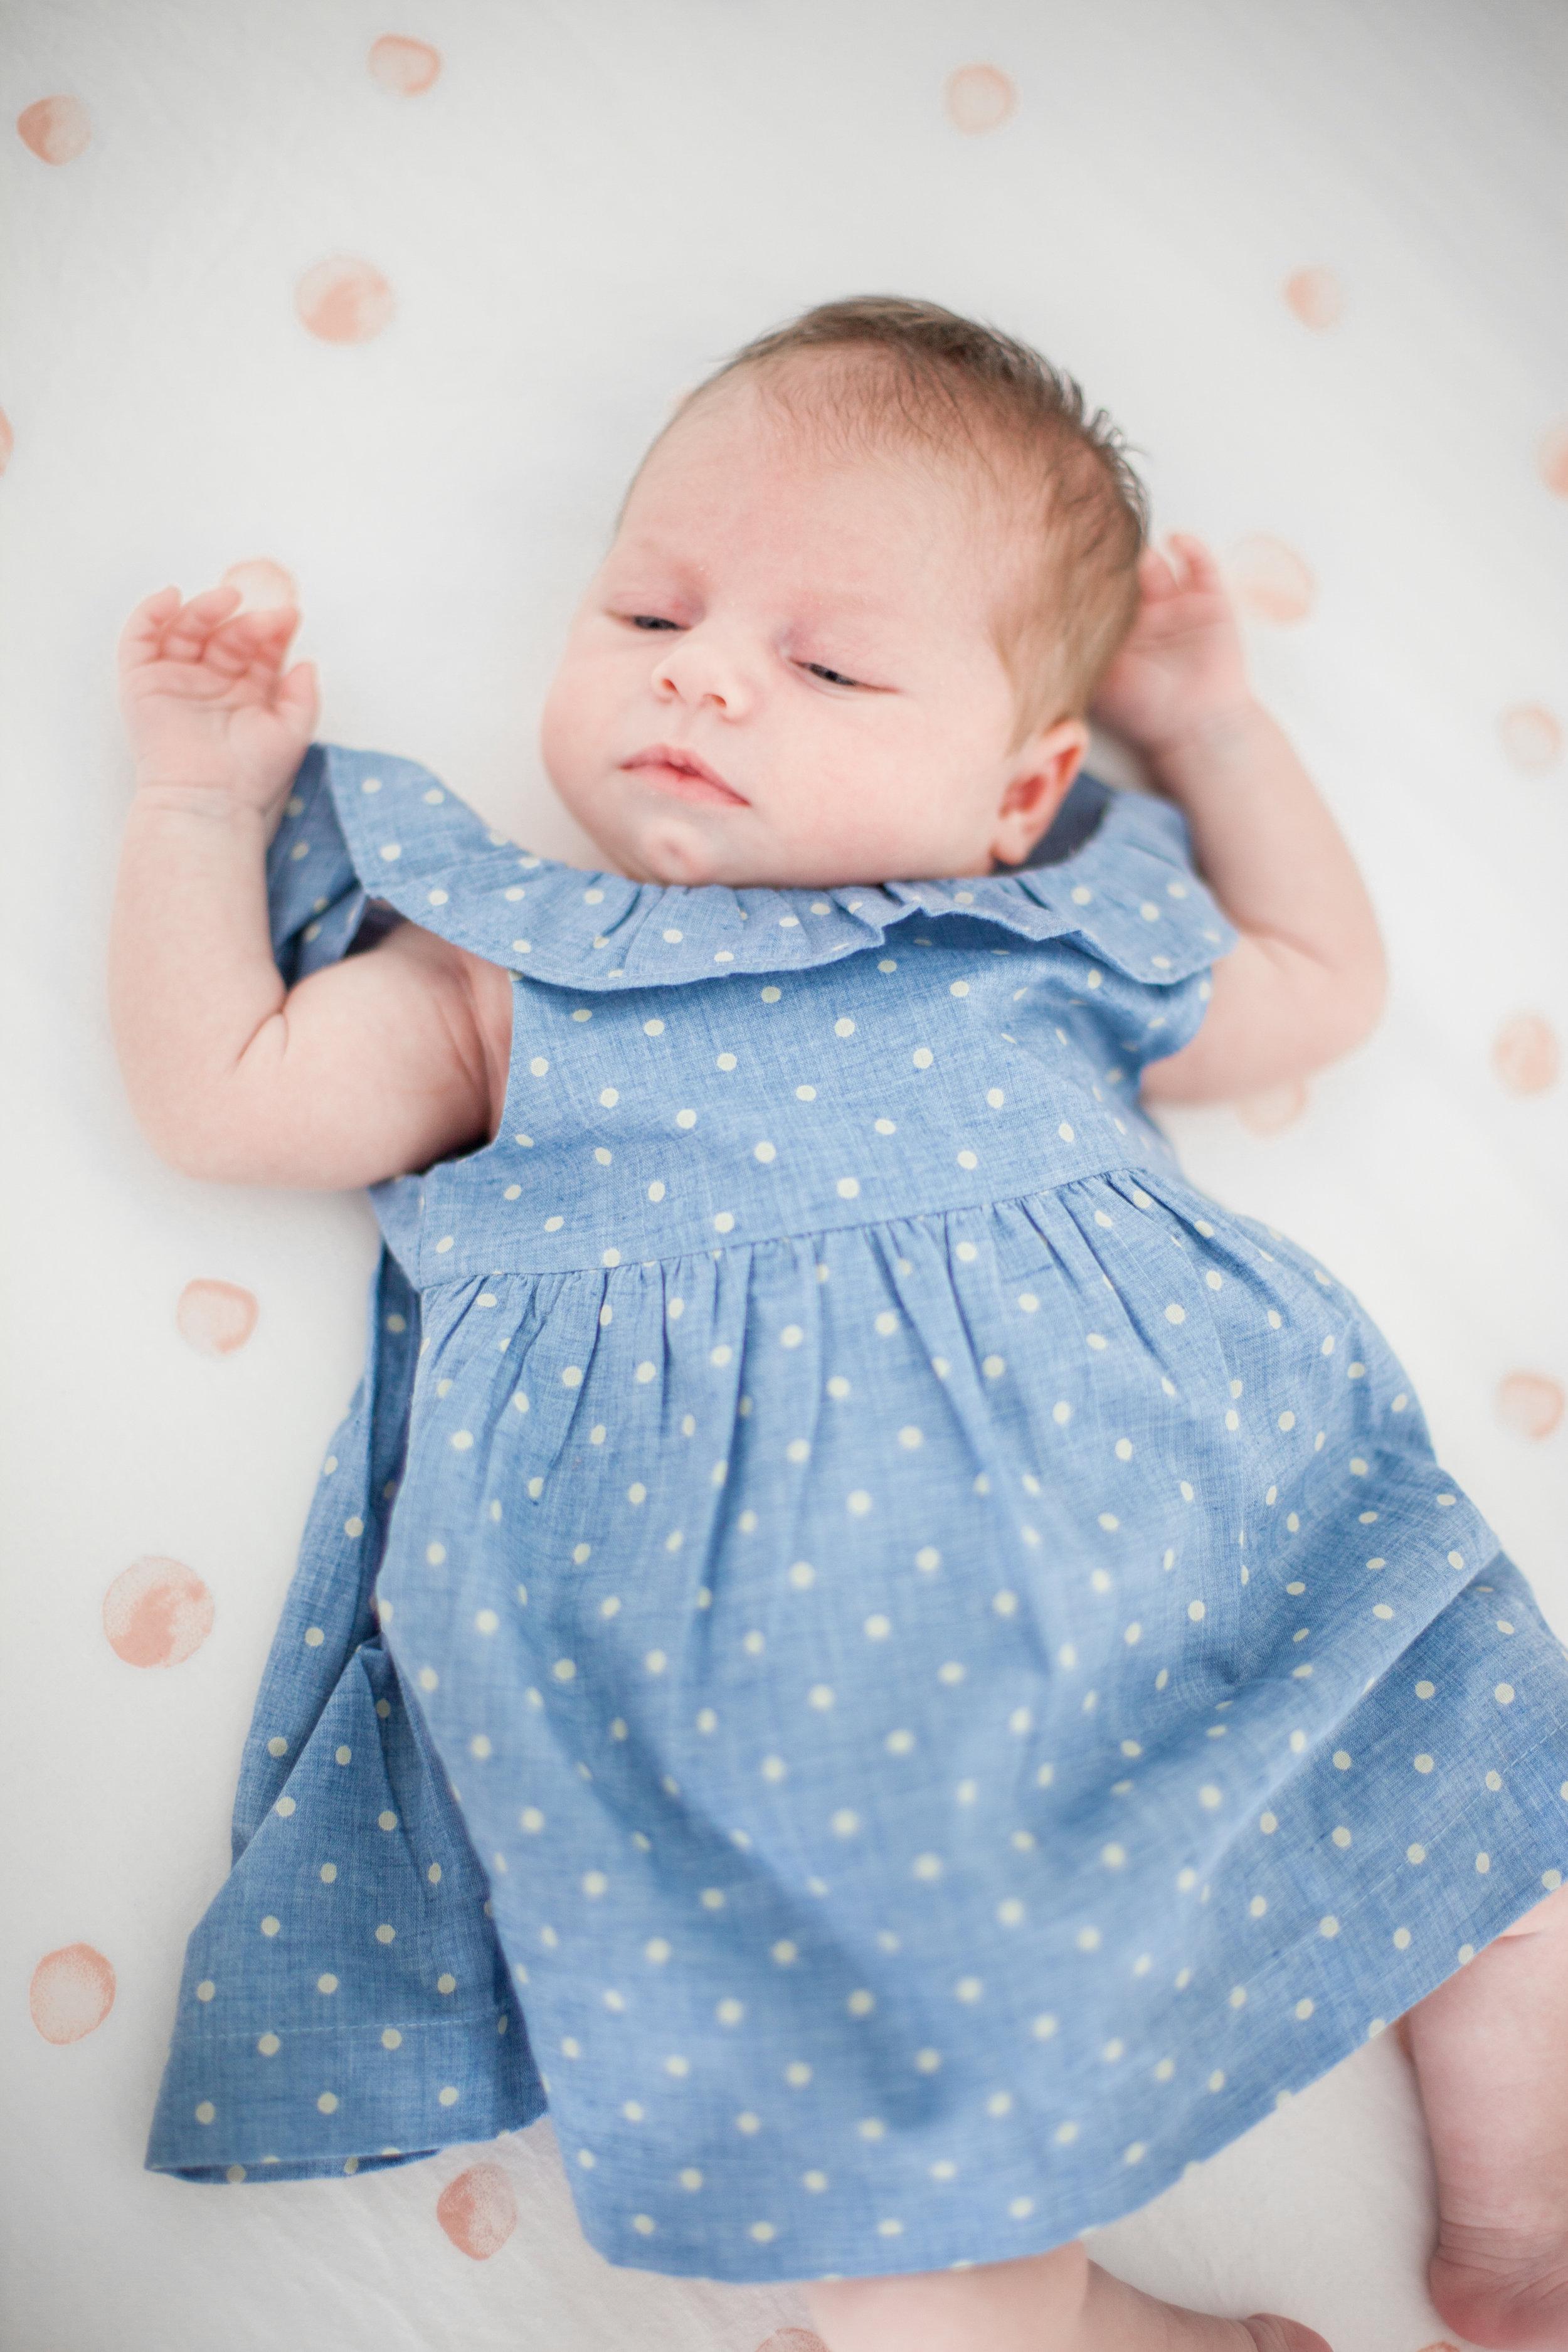 brookhaven-newborn-lifestyle-photography-with-sibling-angela-elliott-wingard-15.jpg